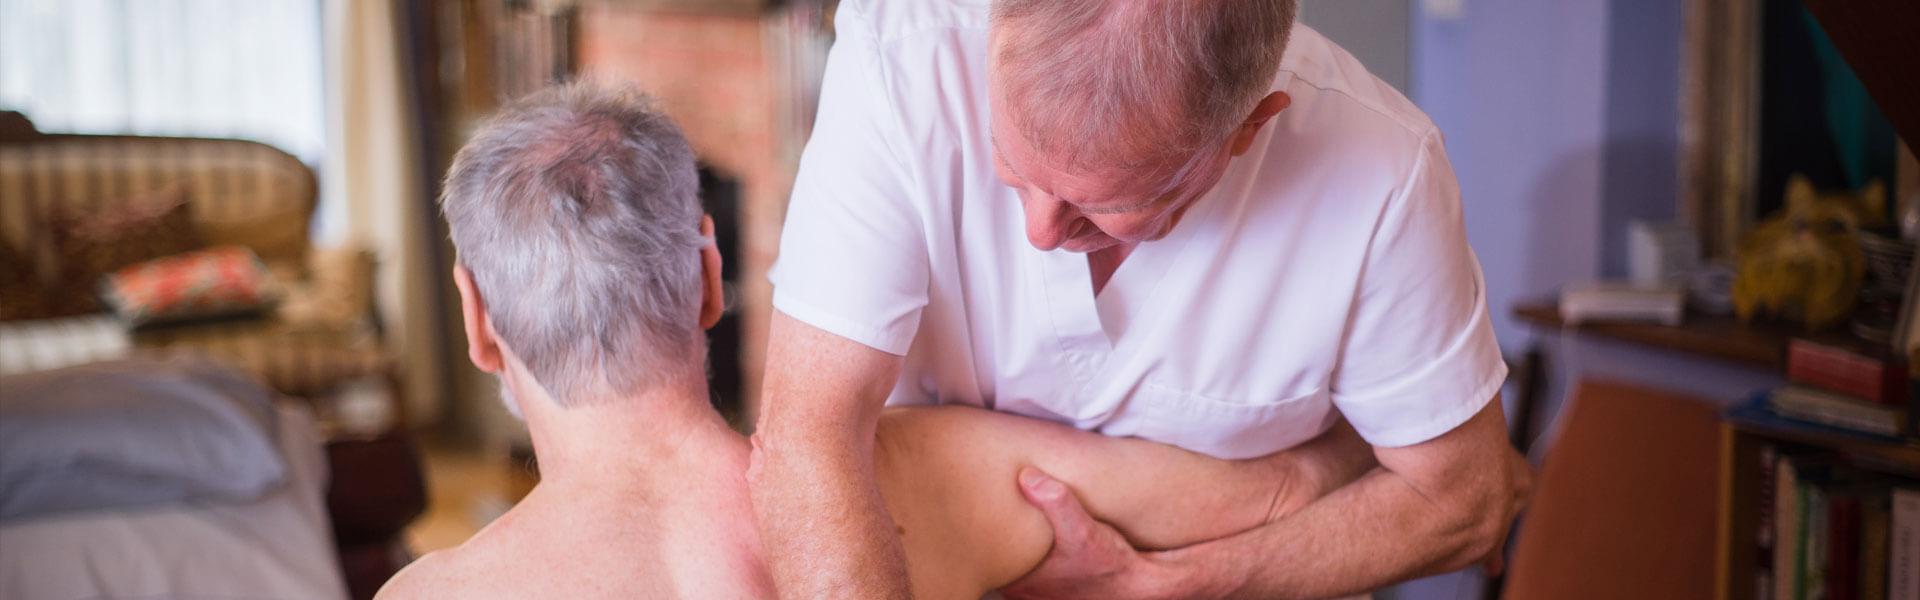 Slider image showing curative massage to back